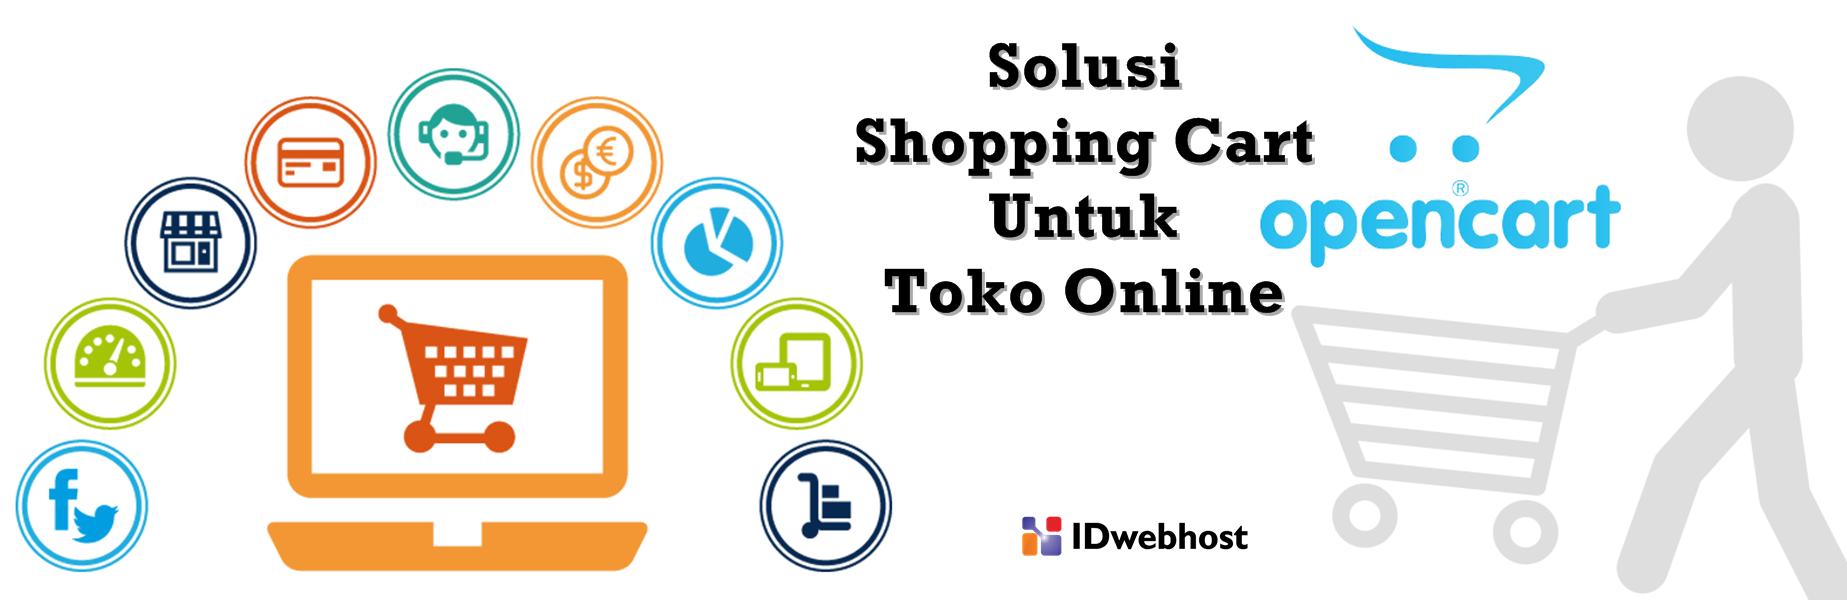 Open Cart, Solusi Shopping Cart Untuk Toko Online